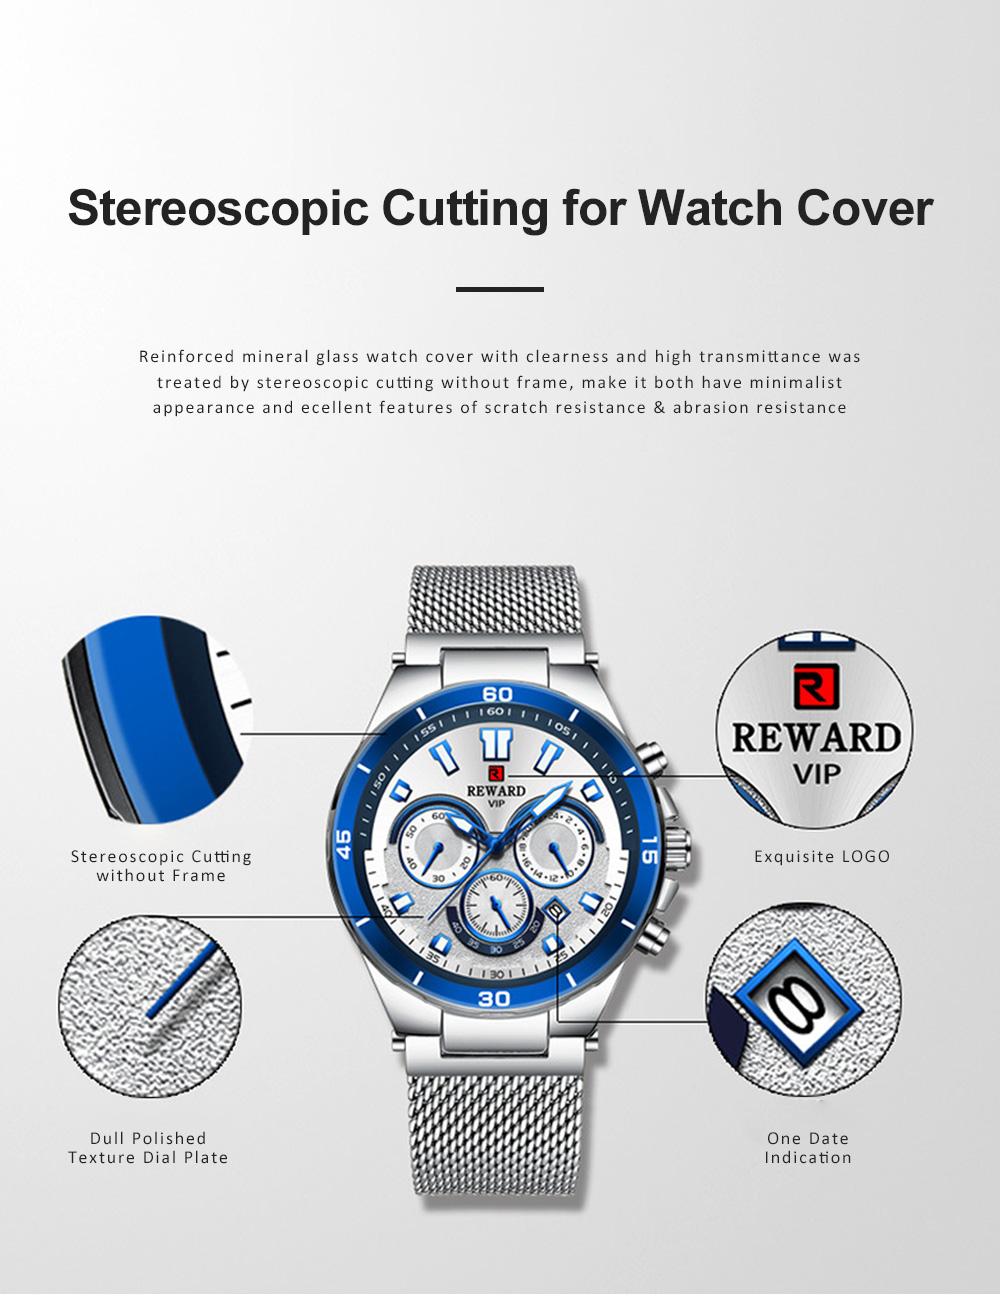 3 Dials Sports Quartz Watch with Adjustable Stainless Steel Watchband, Waterproof Fashion Accessories Wrist Watch for Men 1